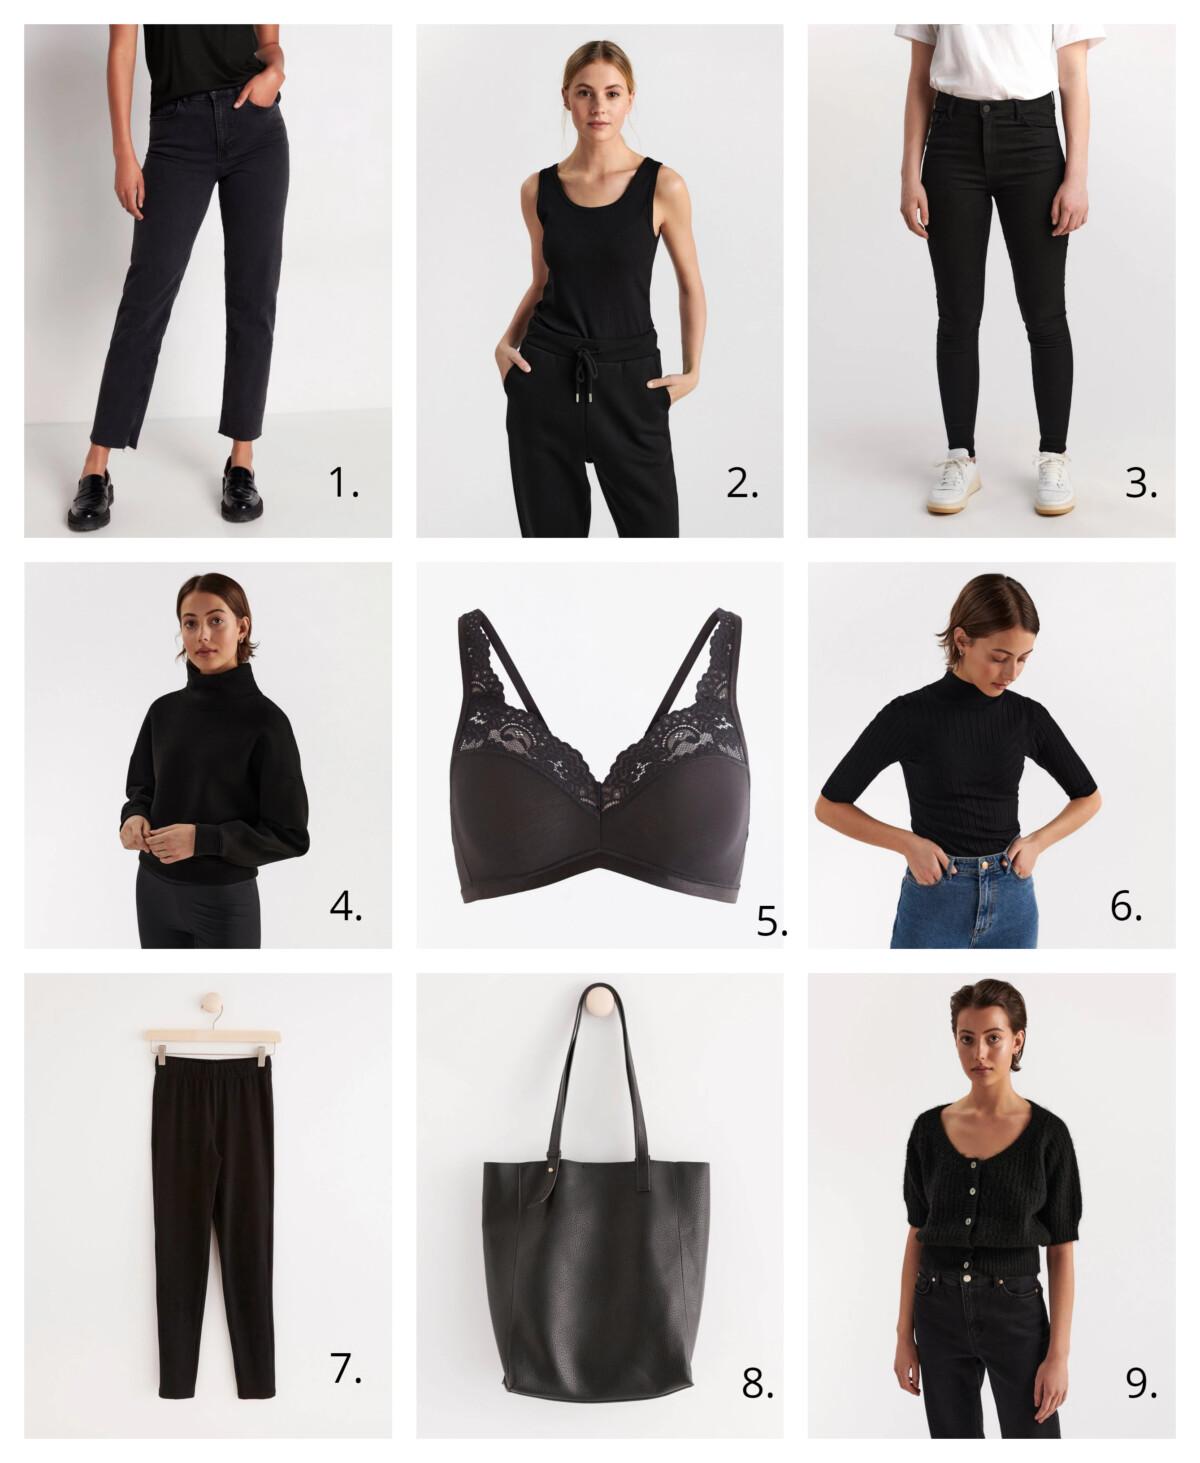 newin-innkjøp-shopping-kjøp-shop-nettshopping-handel-lindex-fashion-style-trend-mote-stil-klær-beige-svart-isalicious-isalicious1-blogg-blogging-blog-isalicious.blogg.no-antrekk-outfit-want-wants